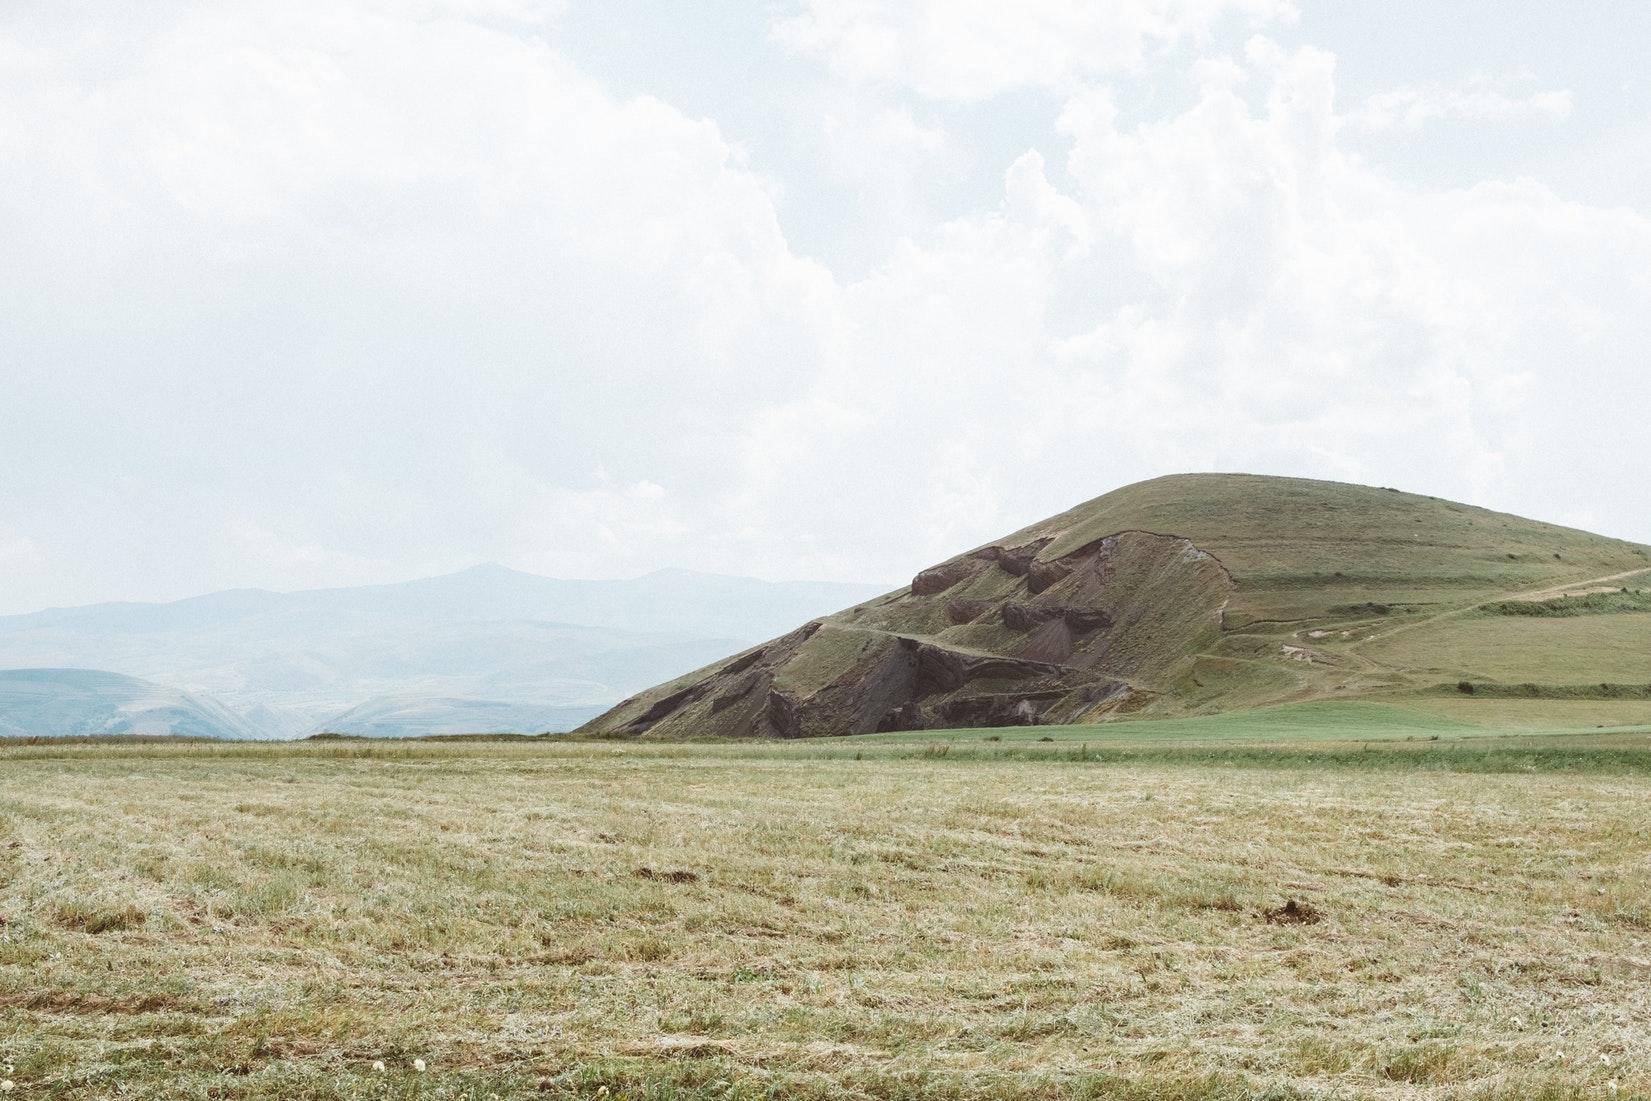 Views of the Armenian highlands